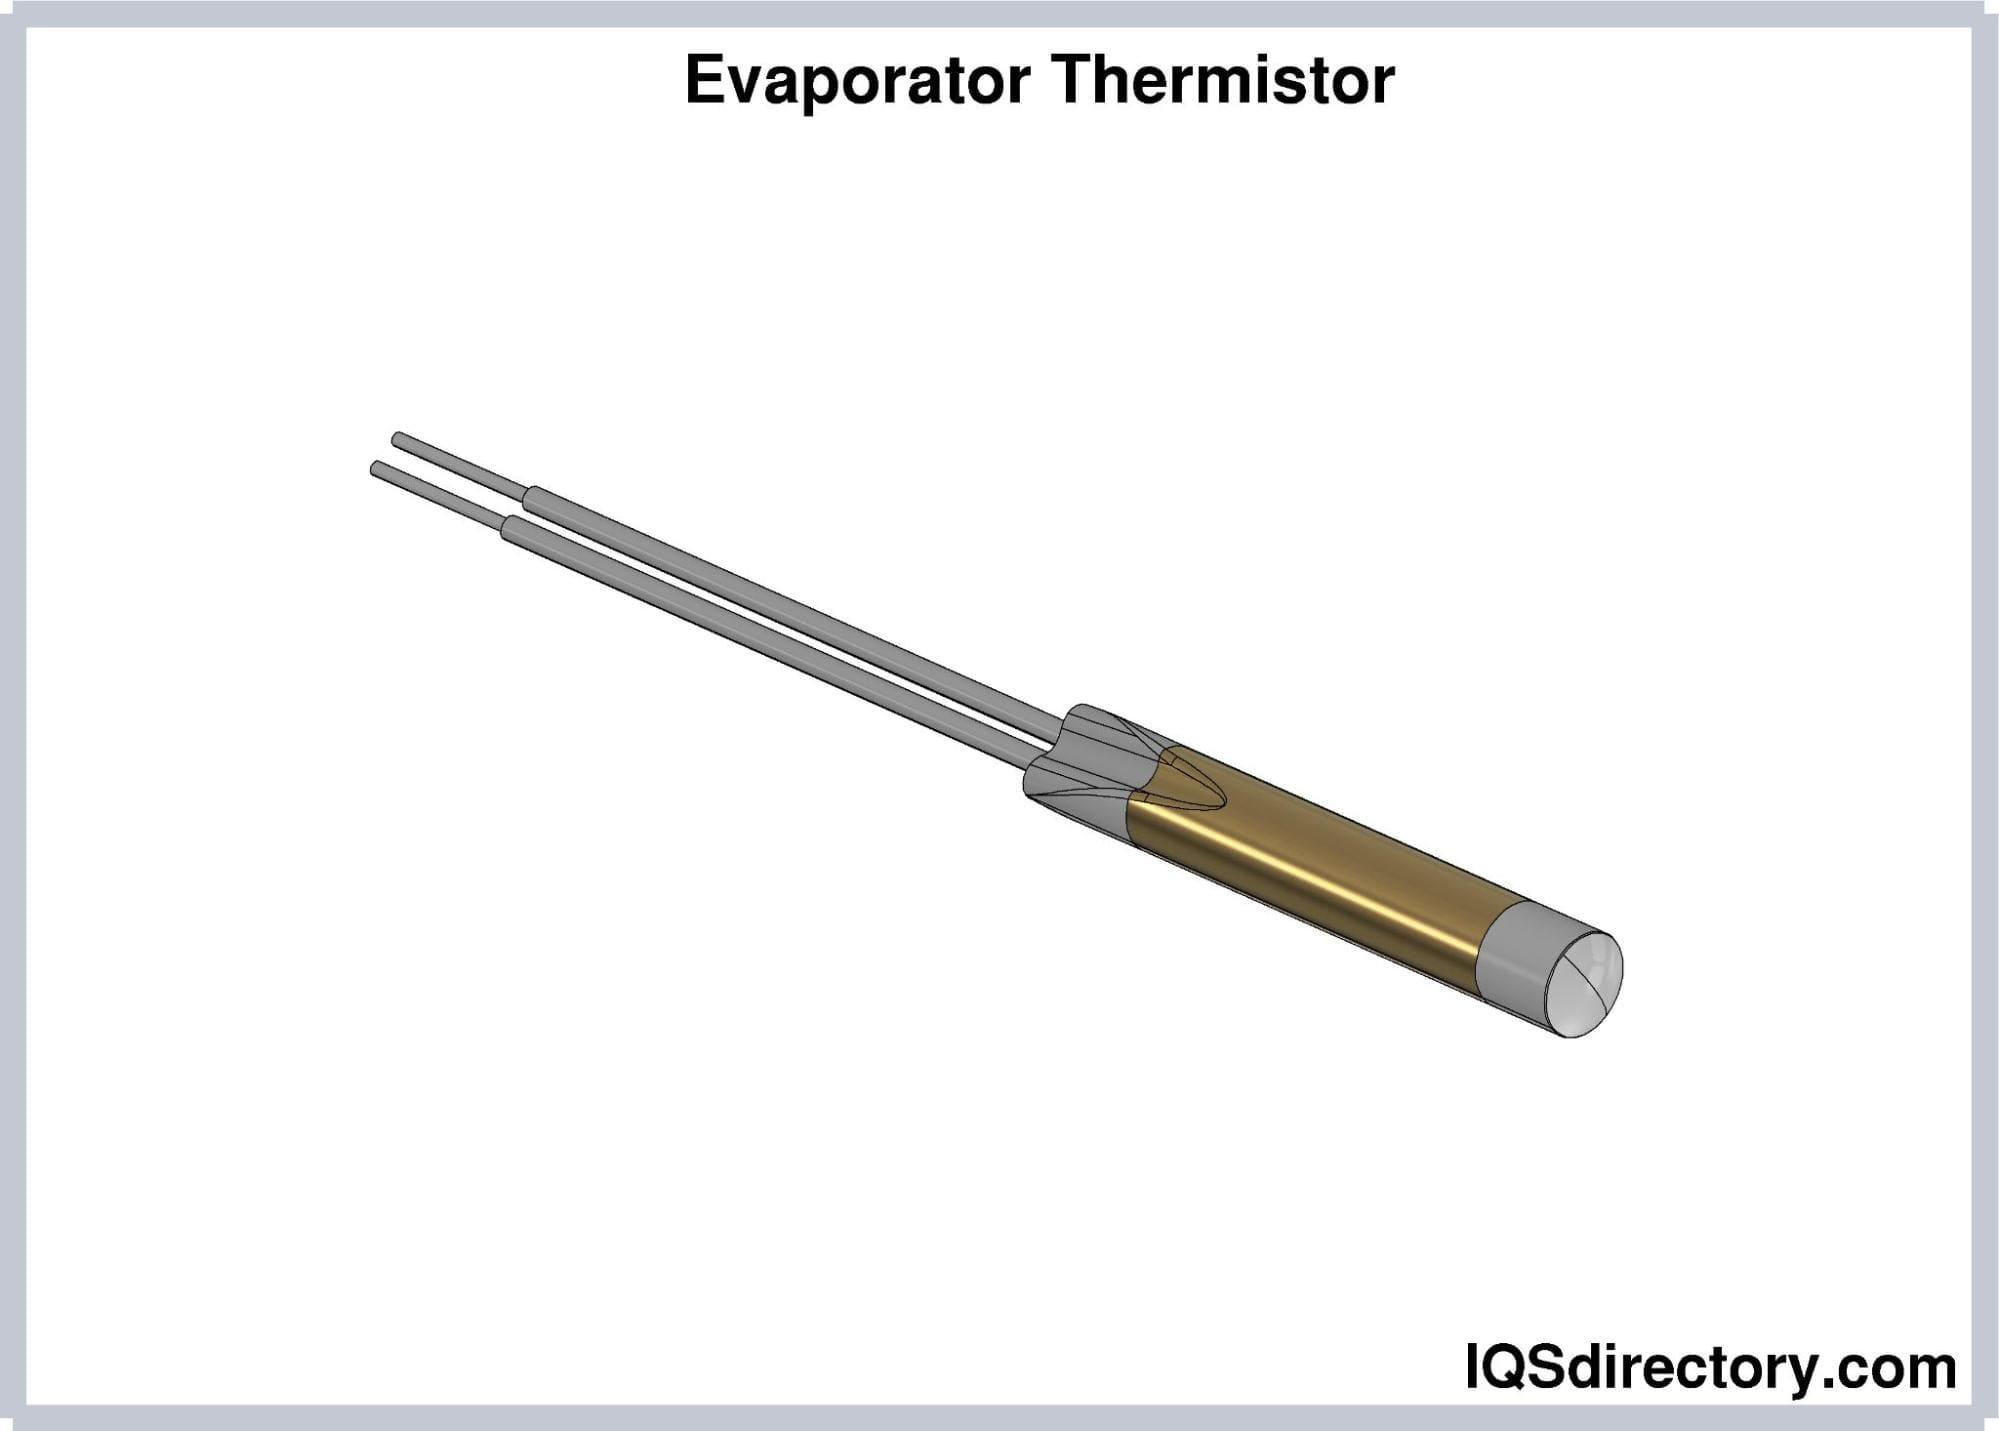 Evaporator Thermistor